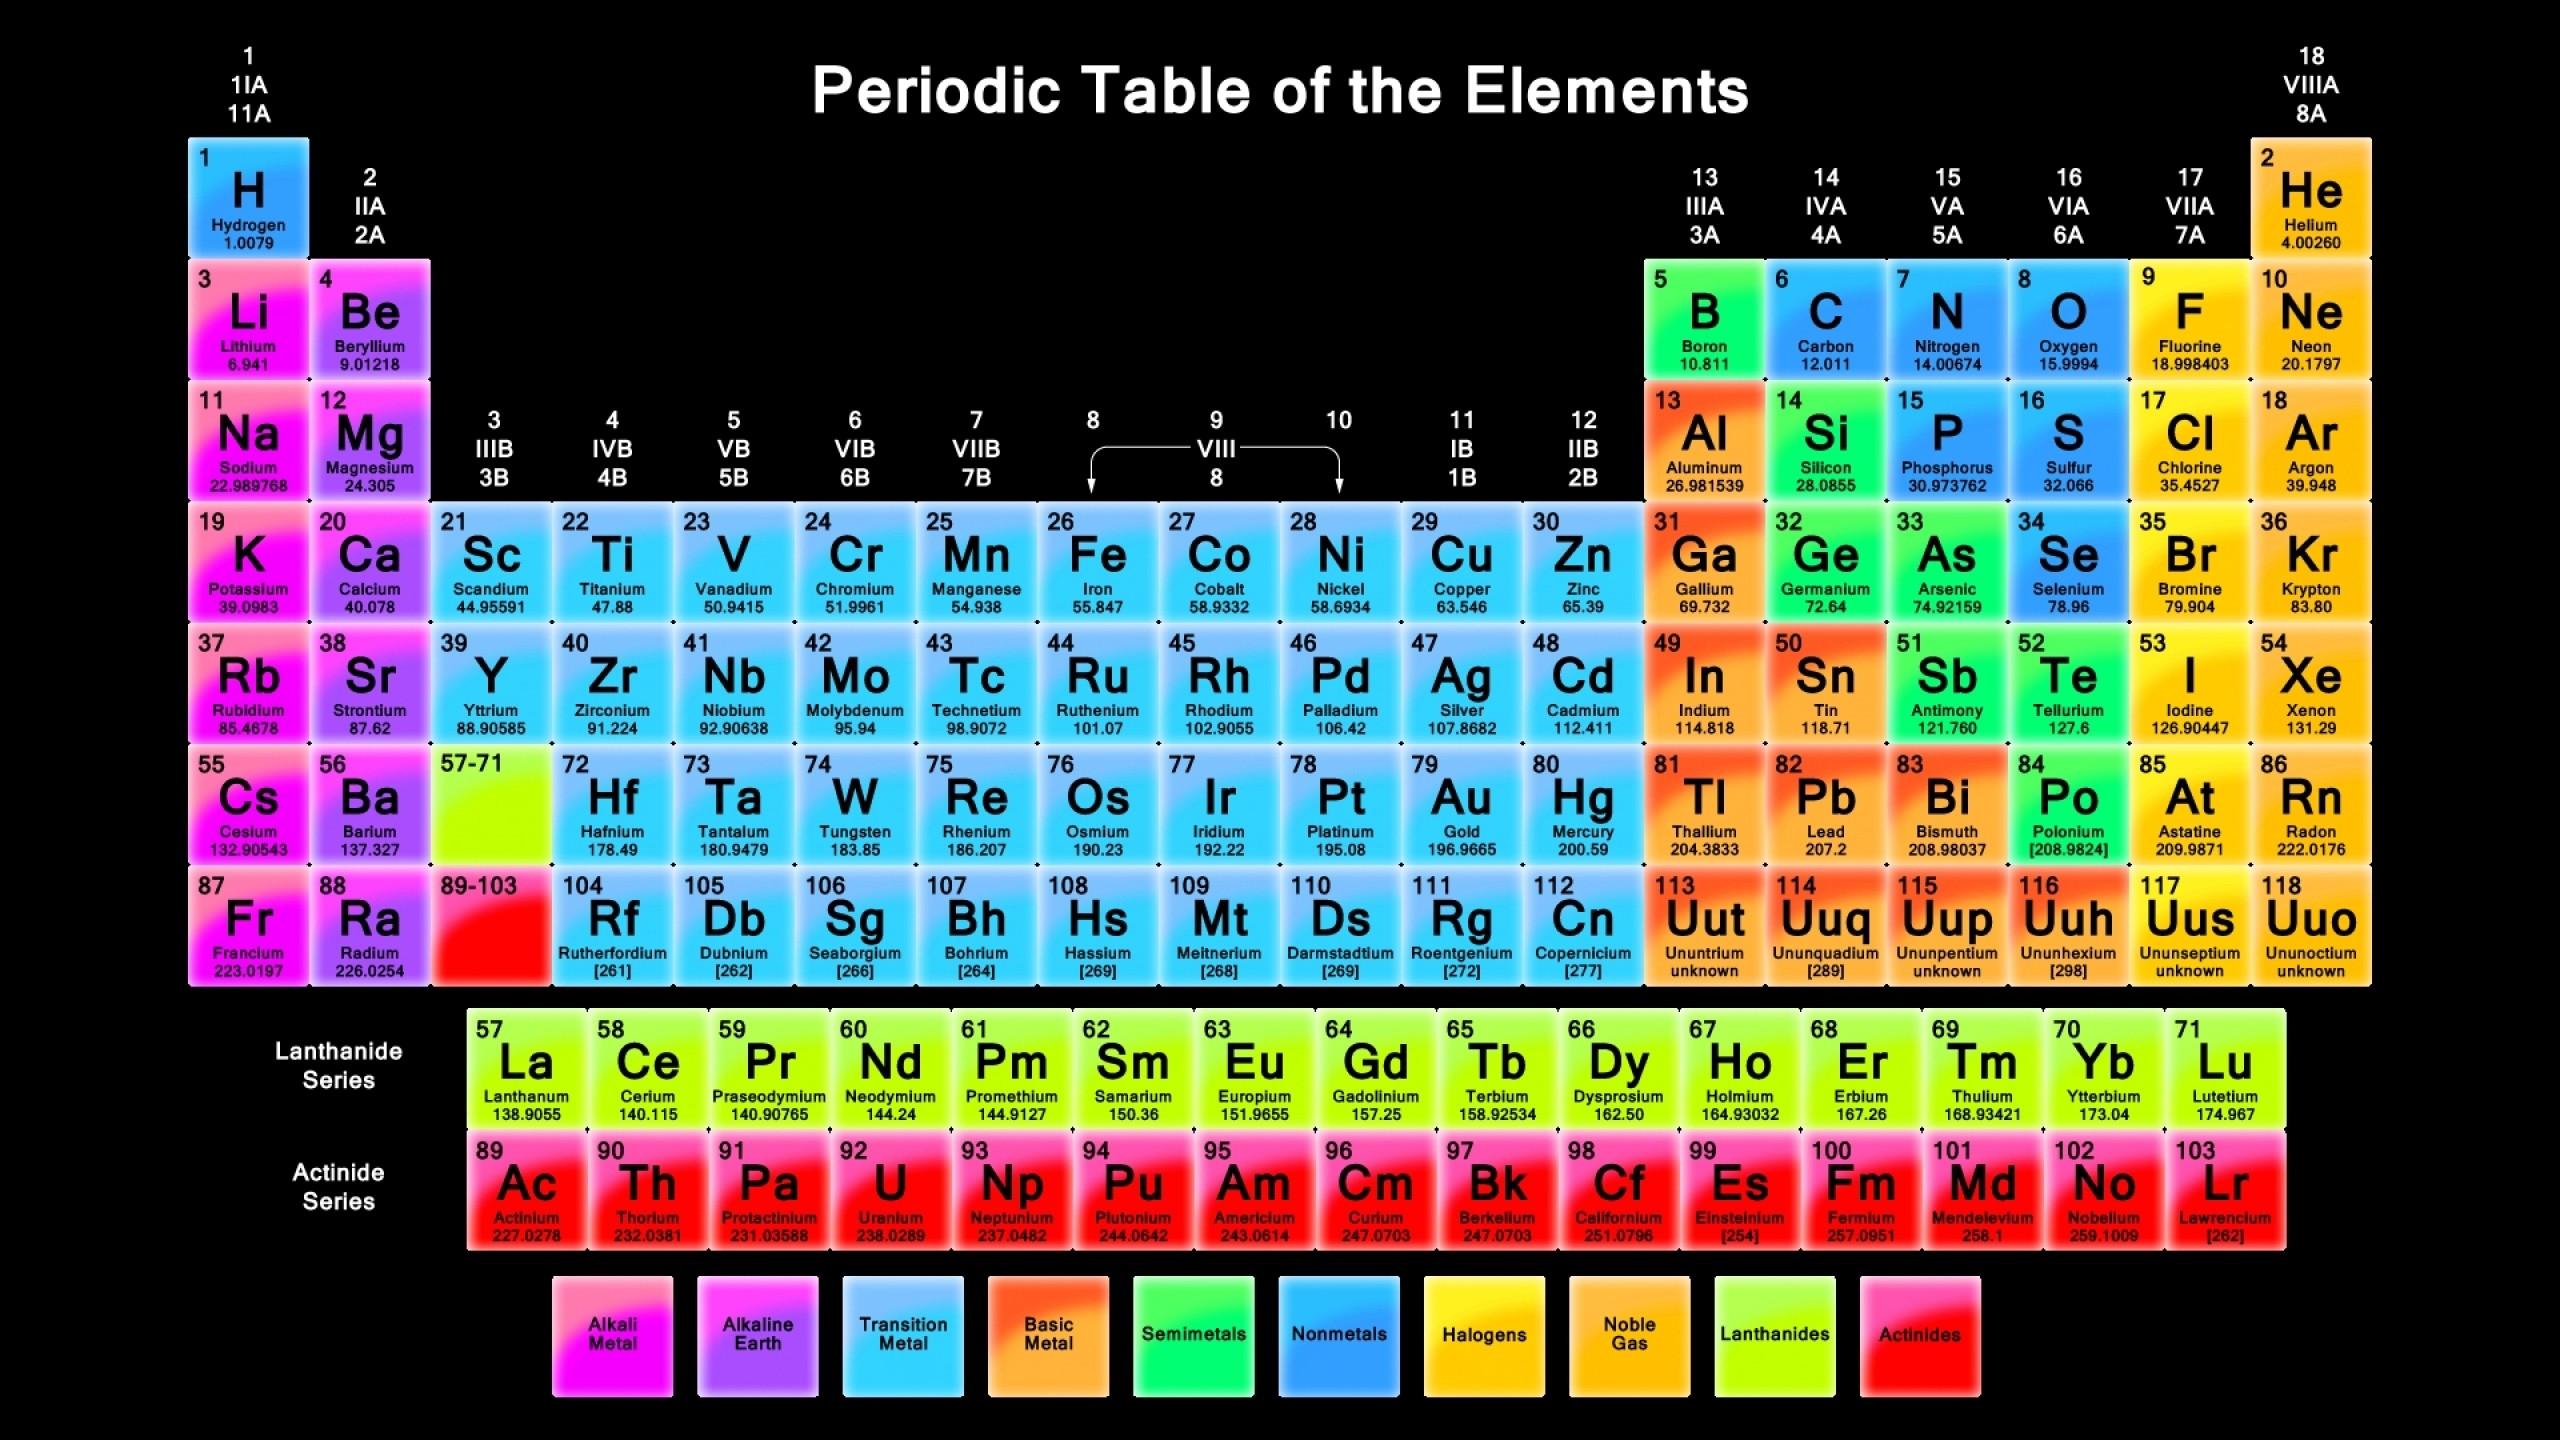 Fondos de pantalla texto elementos qumica tabla peridica texto elementos qumica tabla peridica color forma lnea nmero captura de pantalla fuente instrumento electrnico urtaz Choice Image